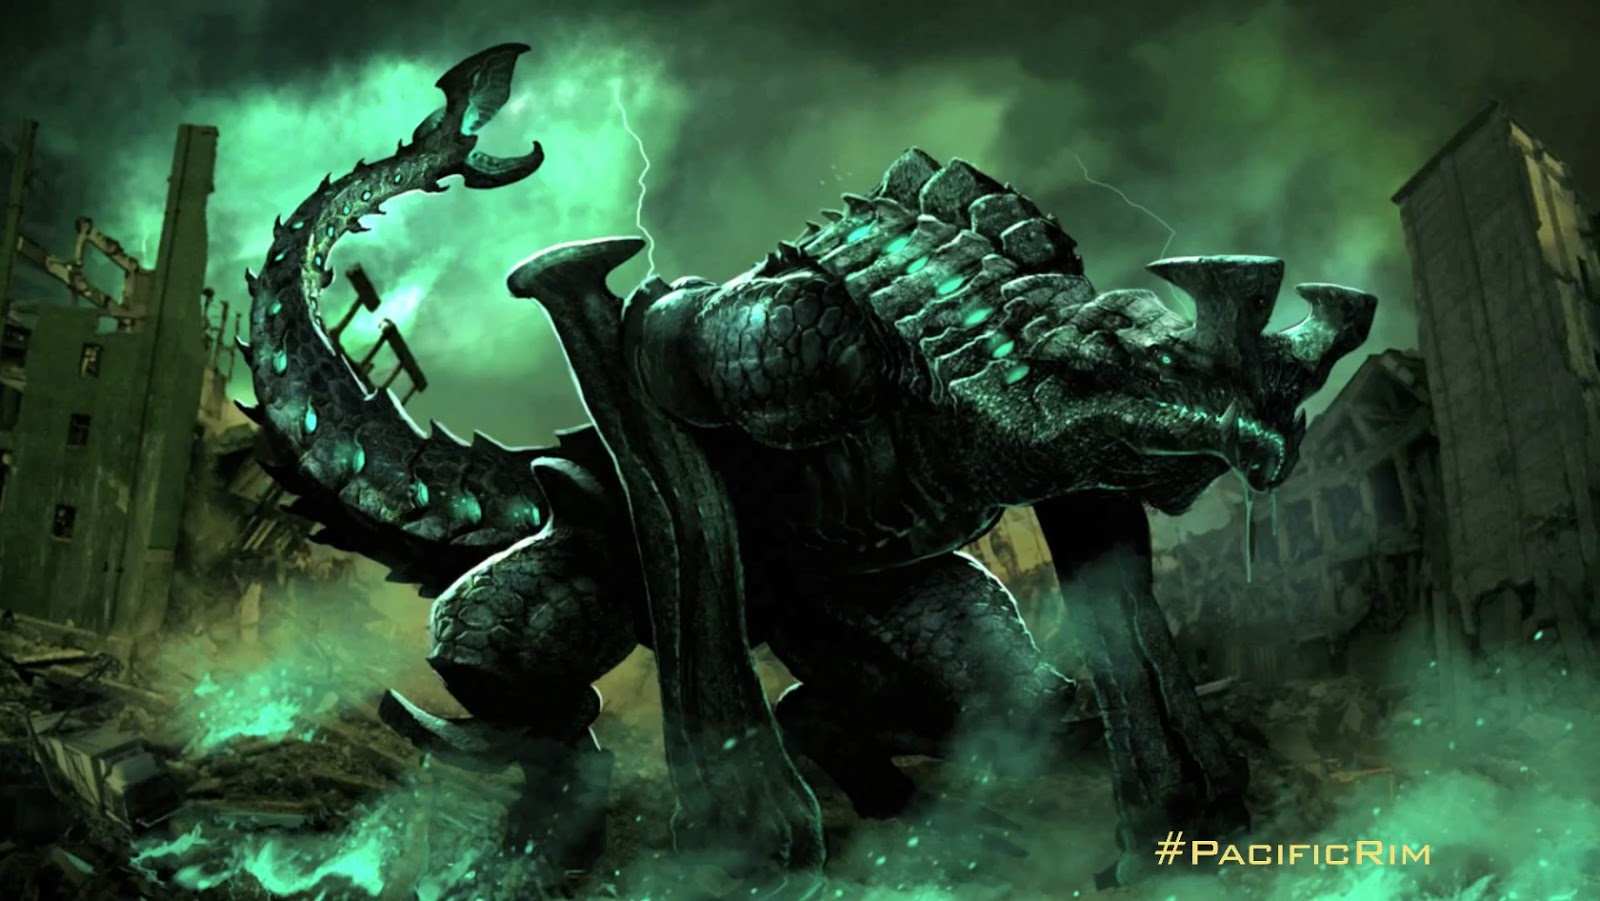 Pacific Rim Kaiju Poster The Geeky Nerfherder: ...